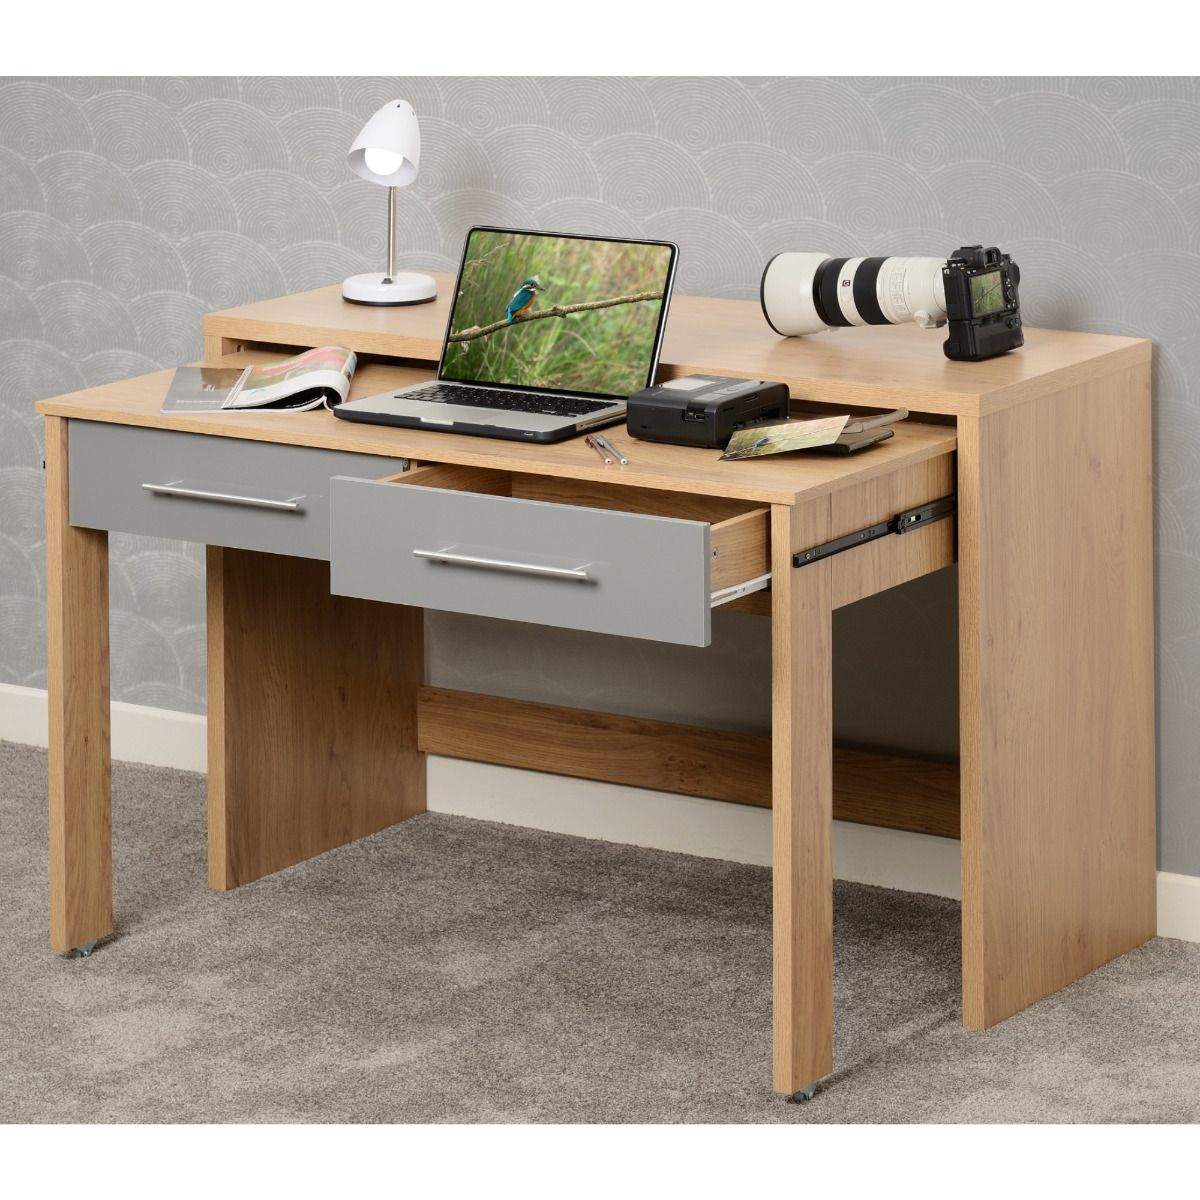 Seville Grey and Light Oak Slider Desk